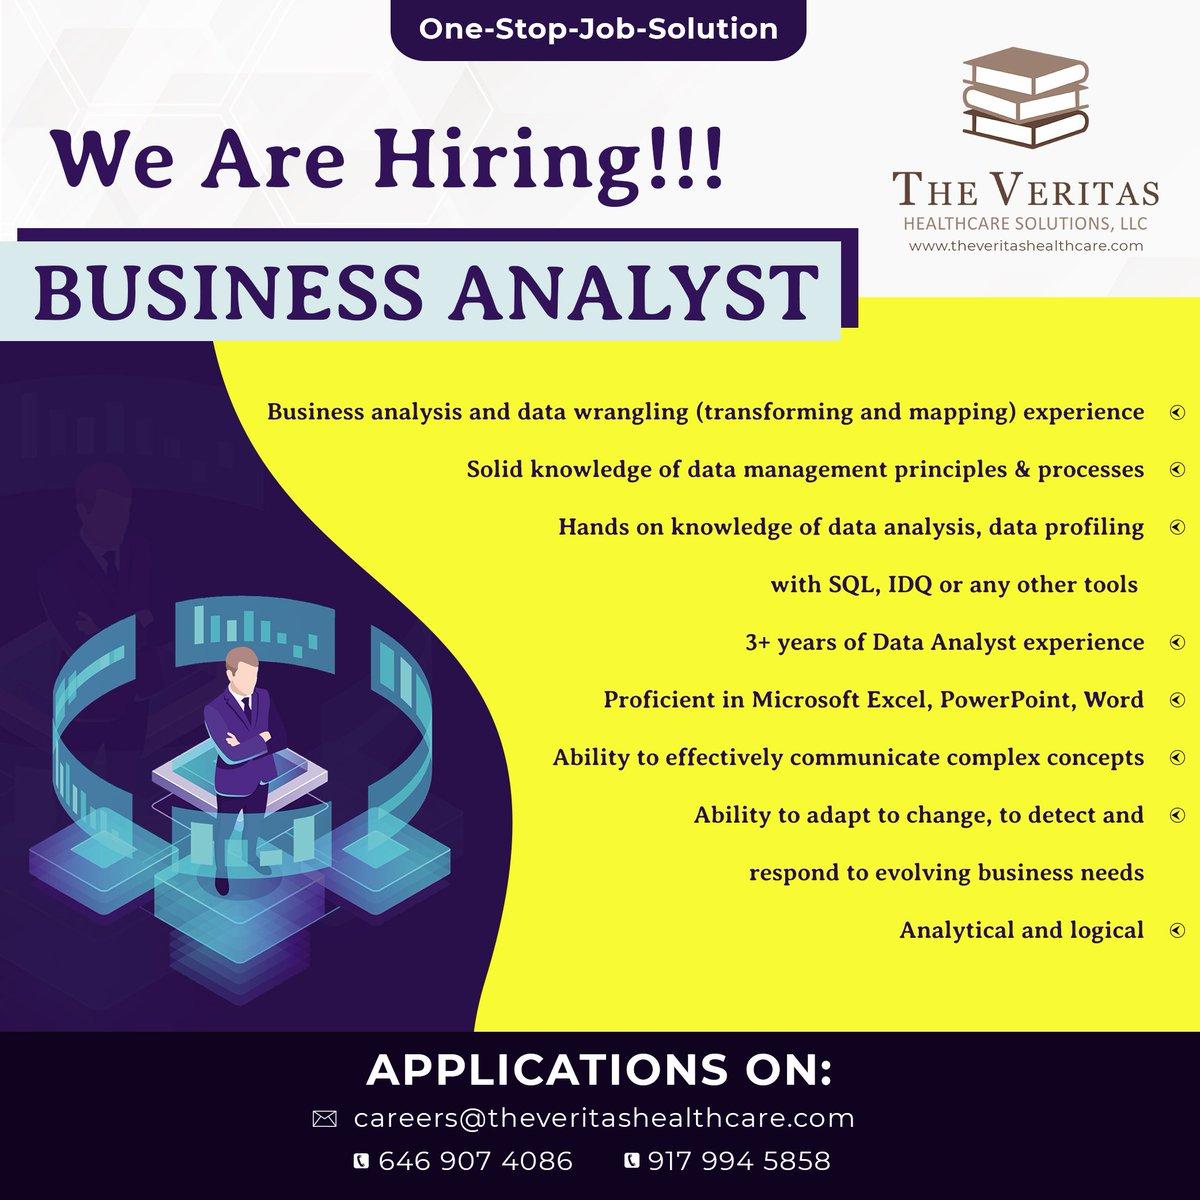 The Veritas Healthcare Solutions LLC - @veritas_llc Twitter